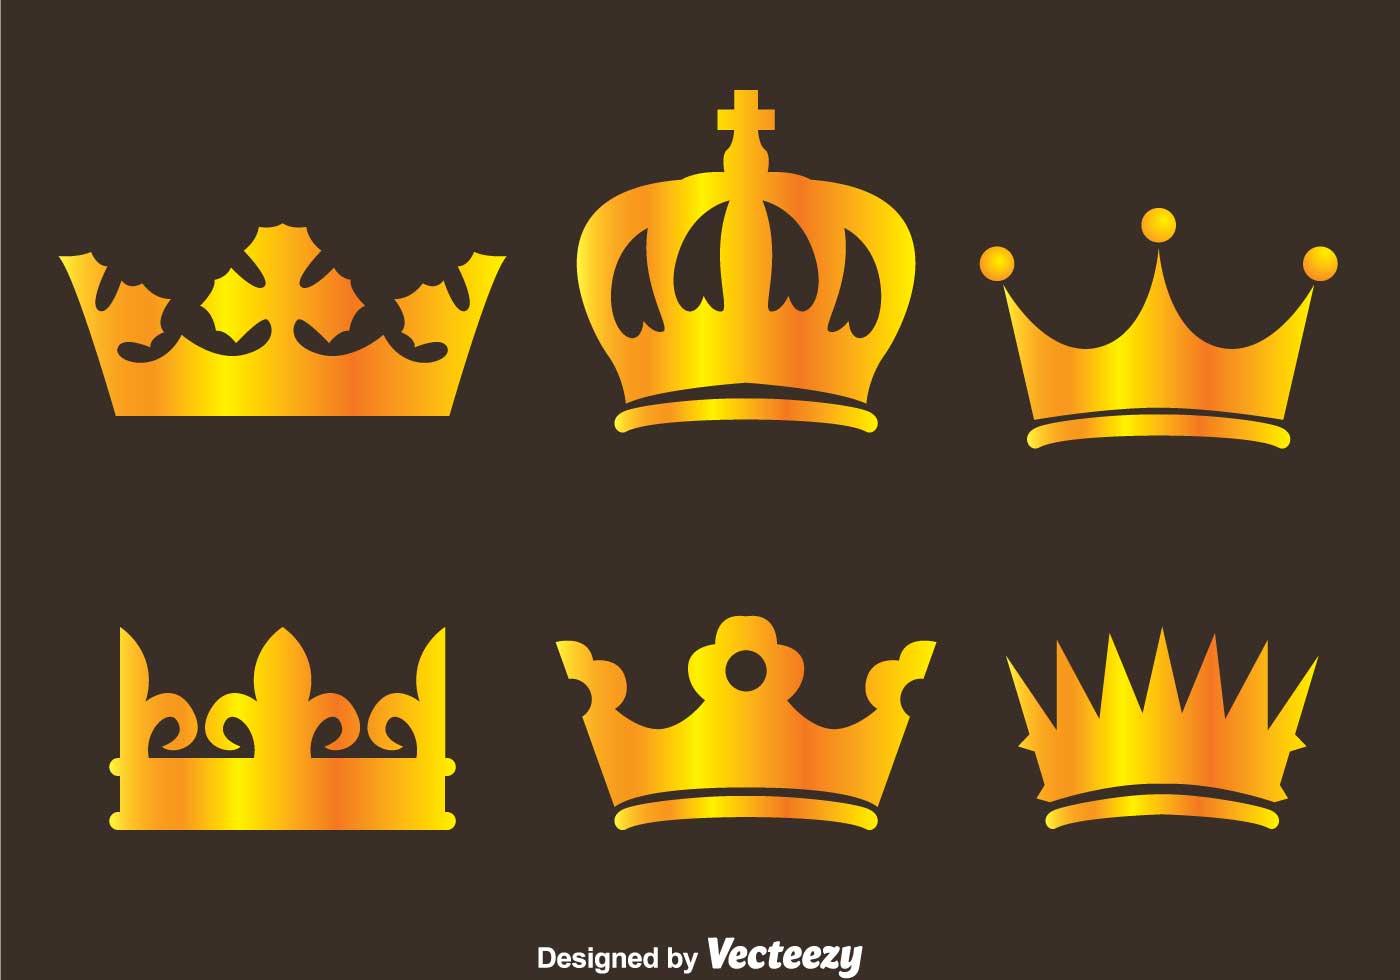 Gold crown logo vectors download free vector art stock graphics gold crown logo vectors download free vector art stock graphics images biocorpaavc Gallery